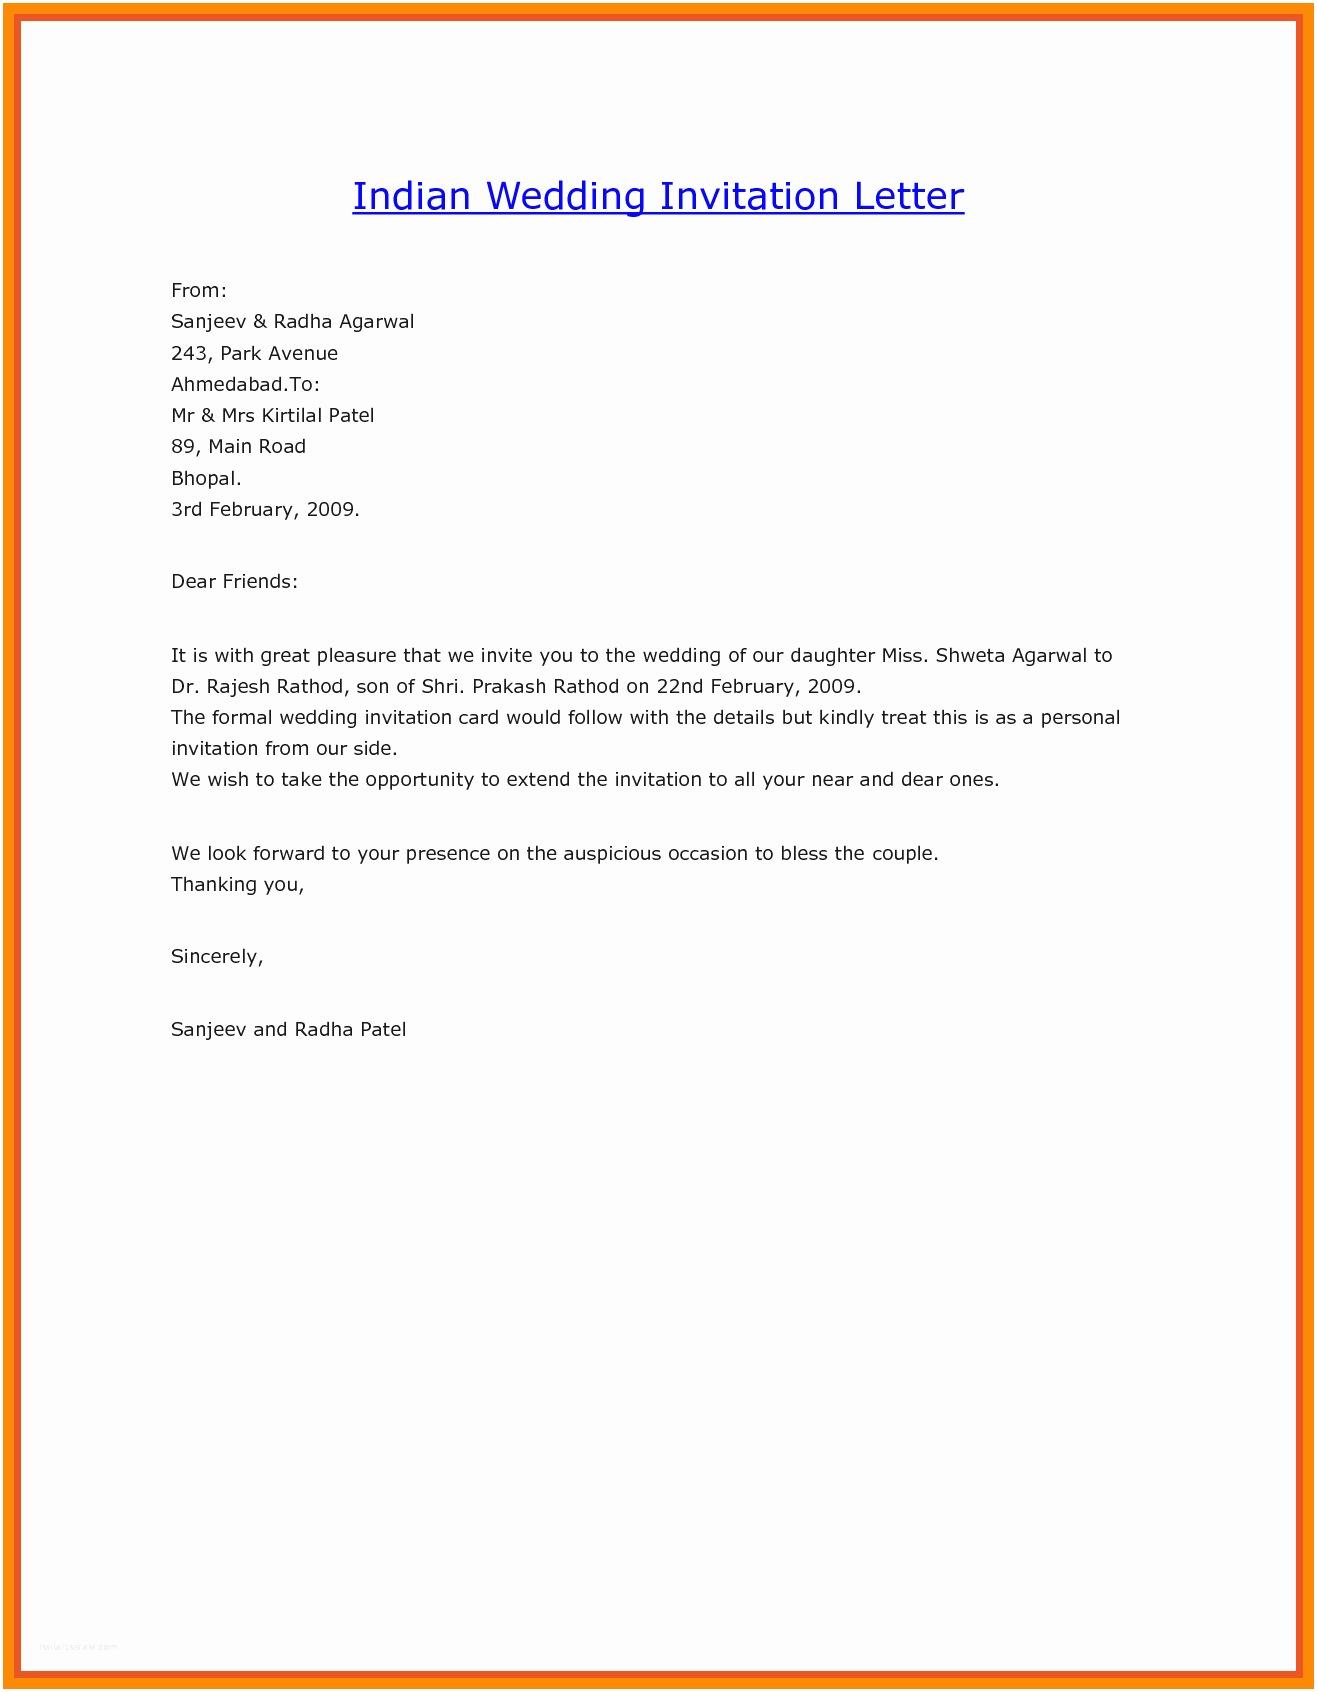 Free Wedding Invitation Samples by Mail Wedding Invitation Mail format Yourweek 30b2a3eca25e